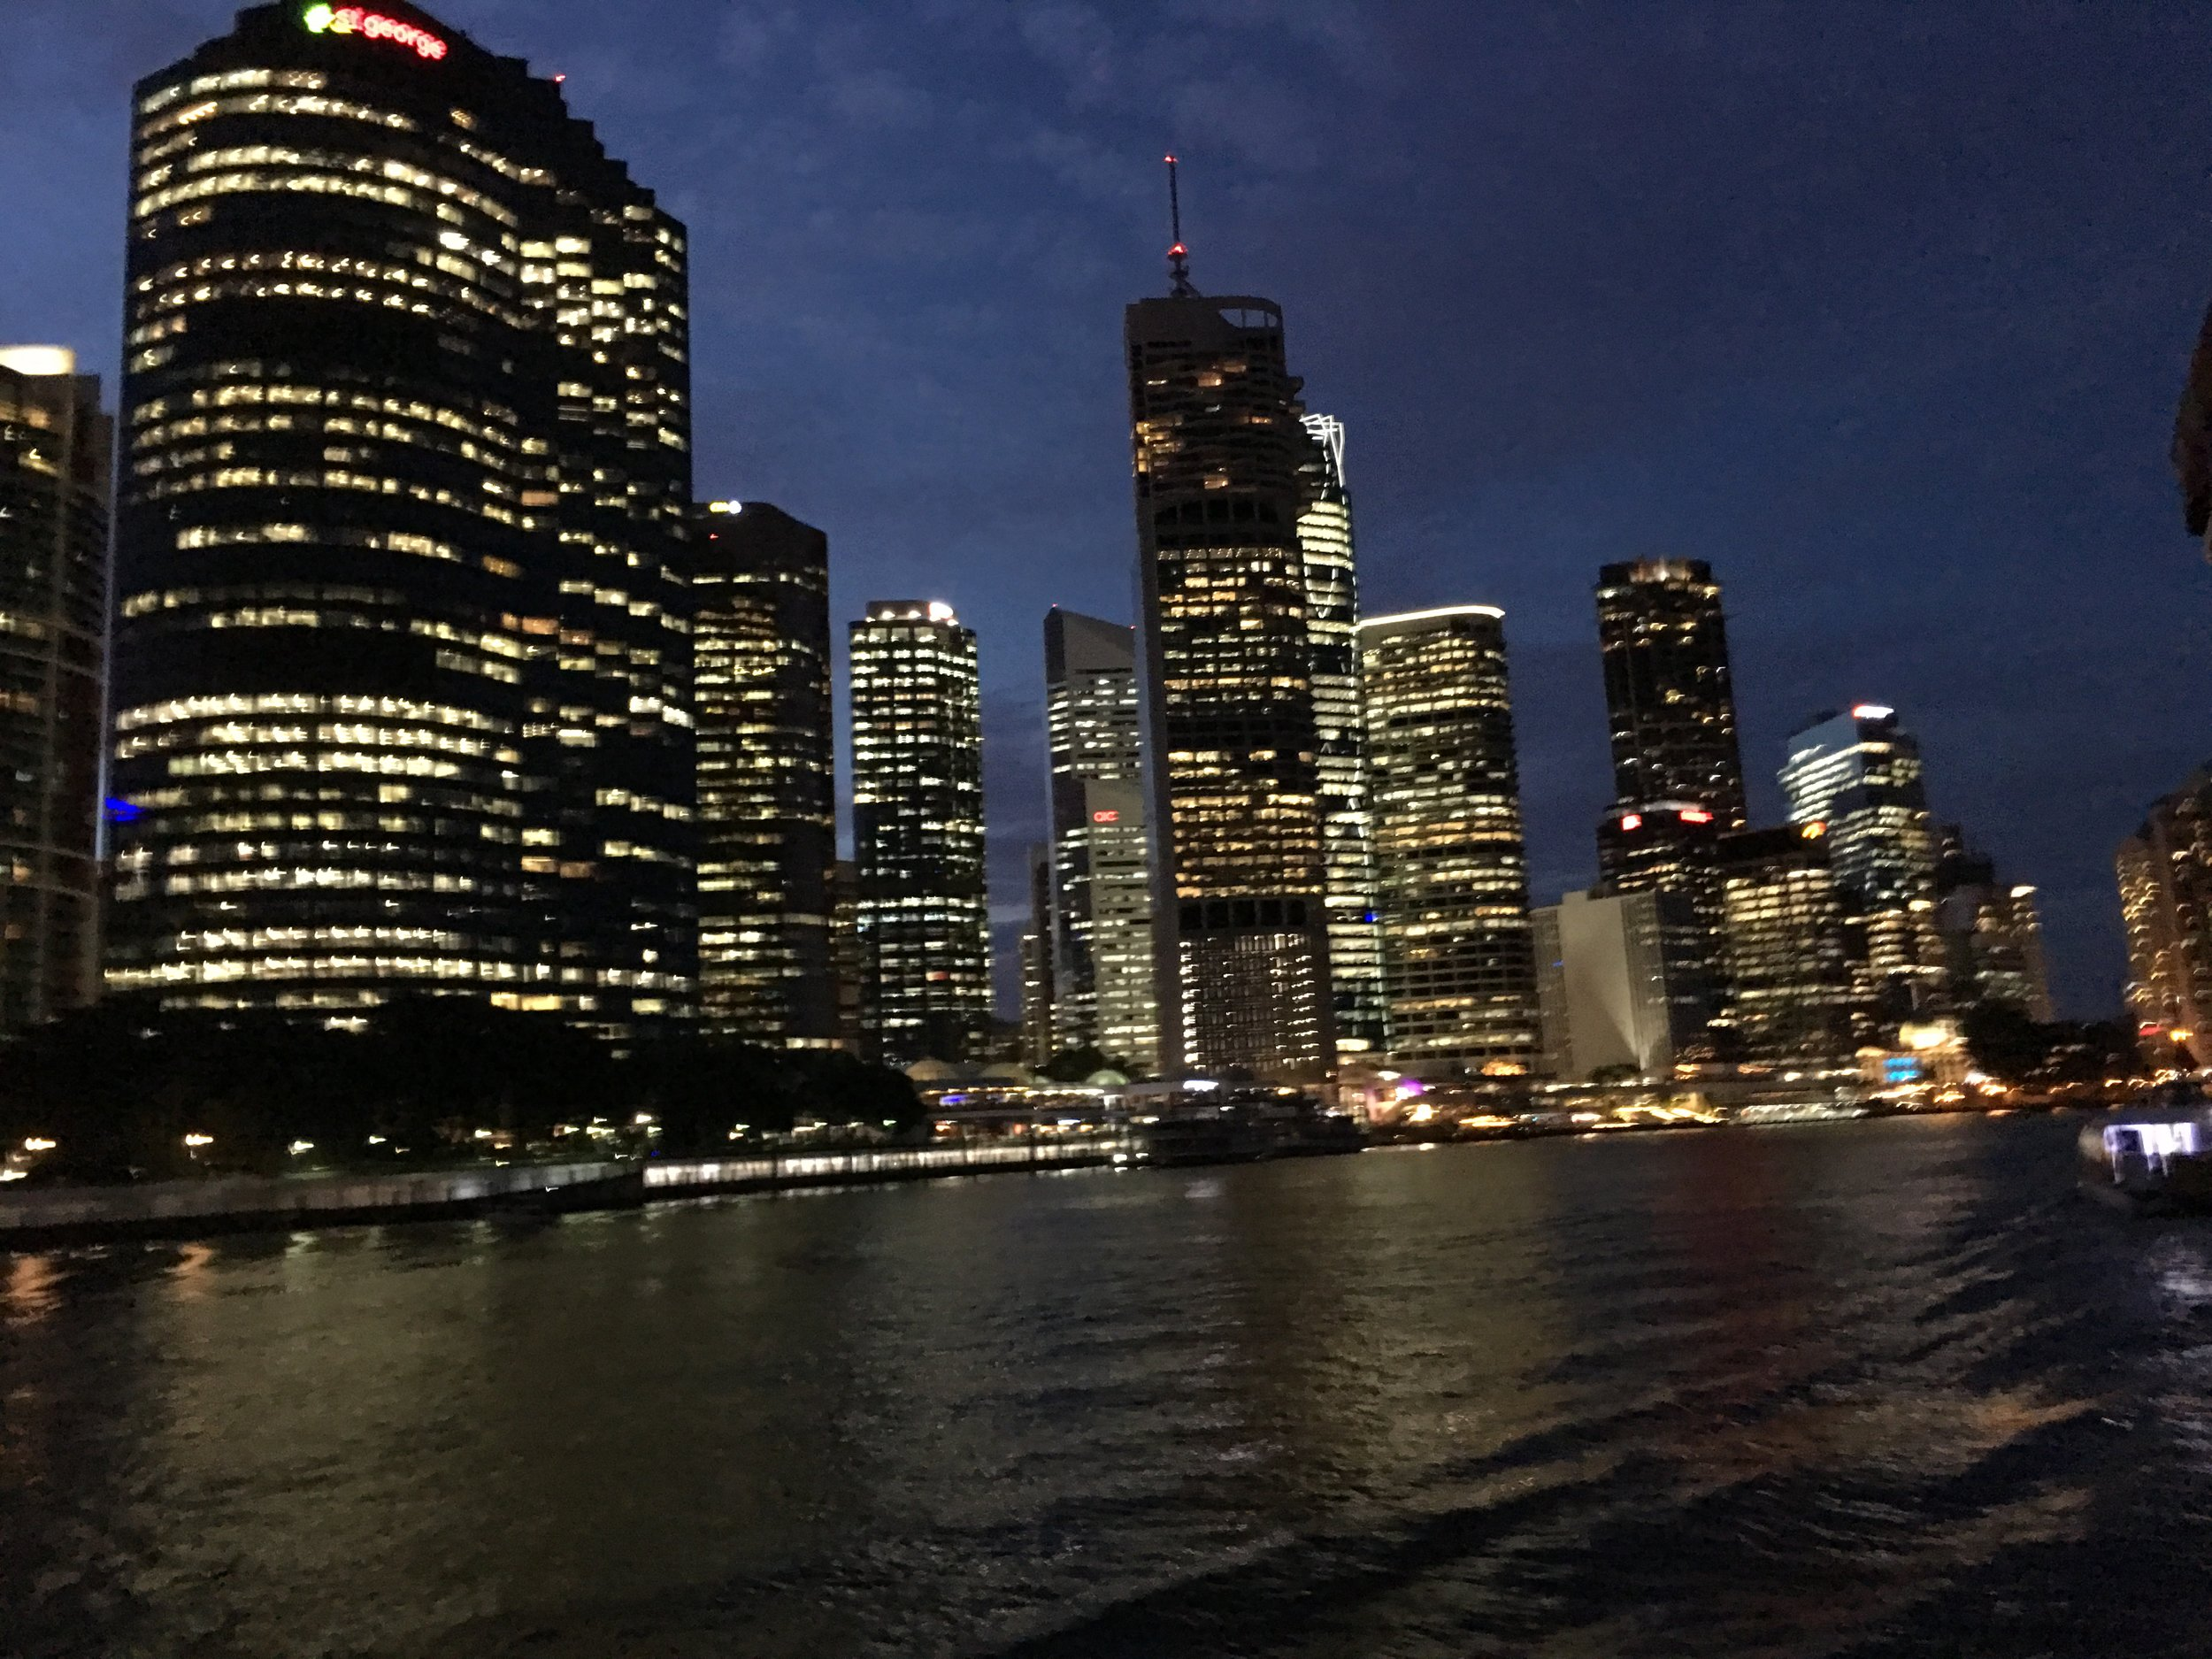 Brisbane skyline at night. Louise Teo